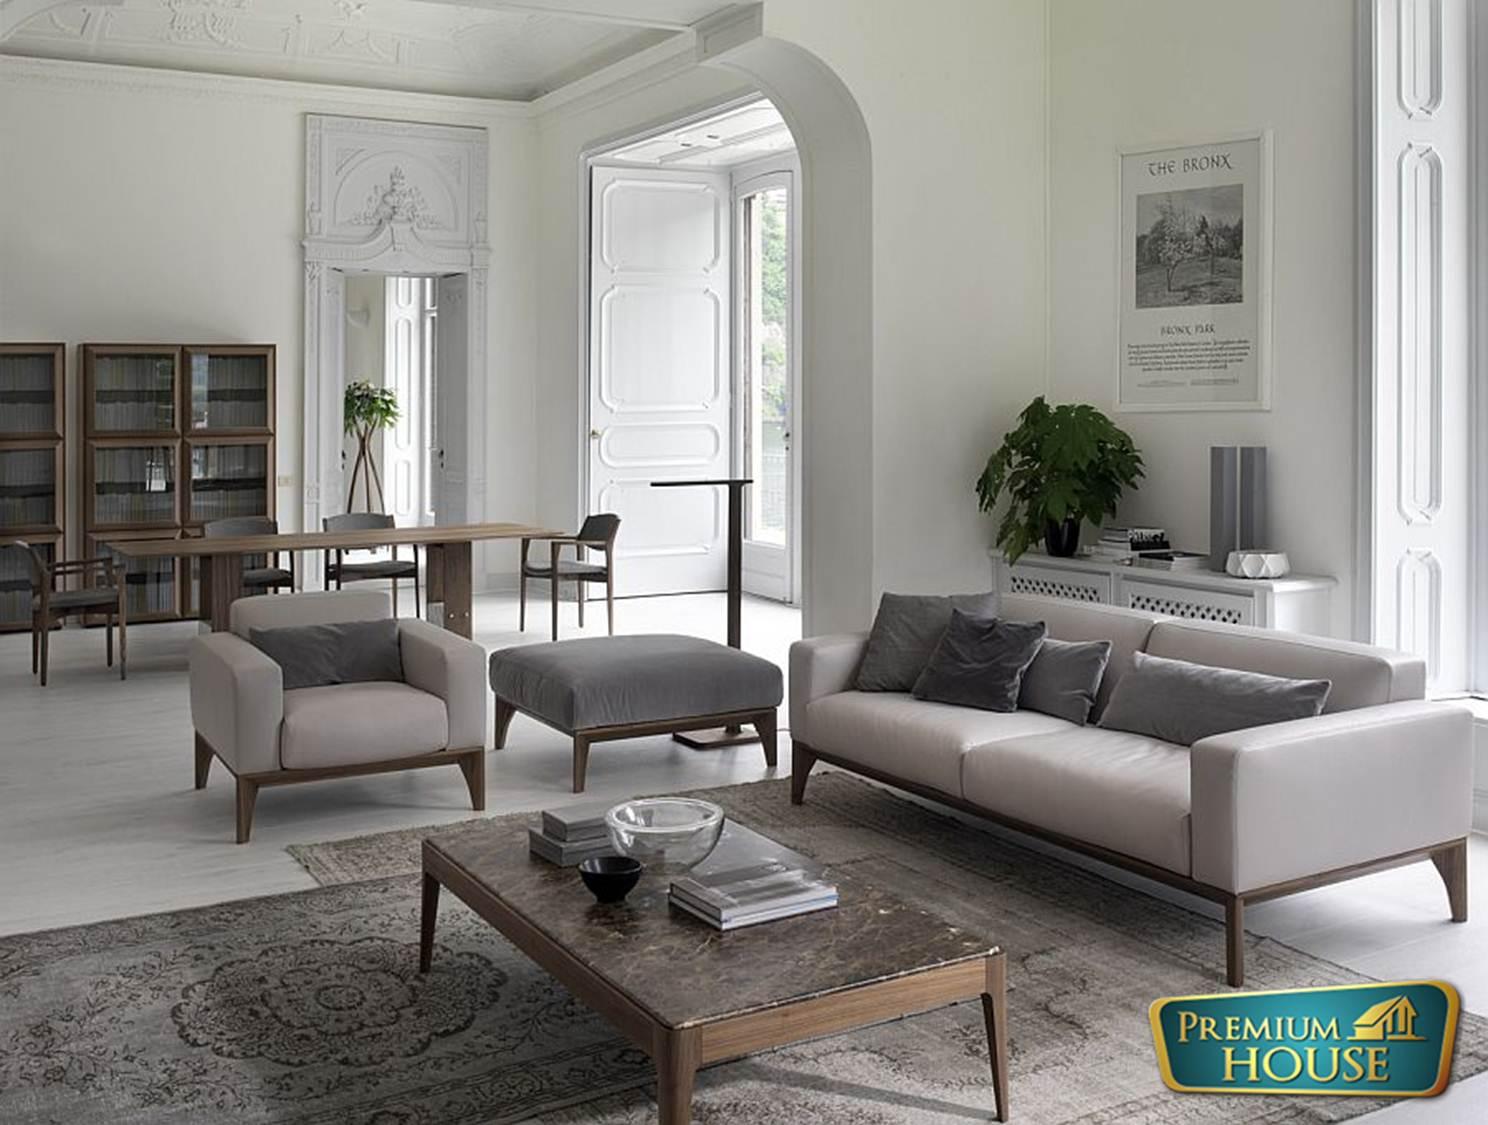 Premium House: Refresh Your Living Room: Trio of Comfy ...